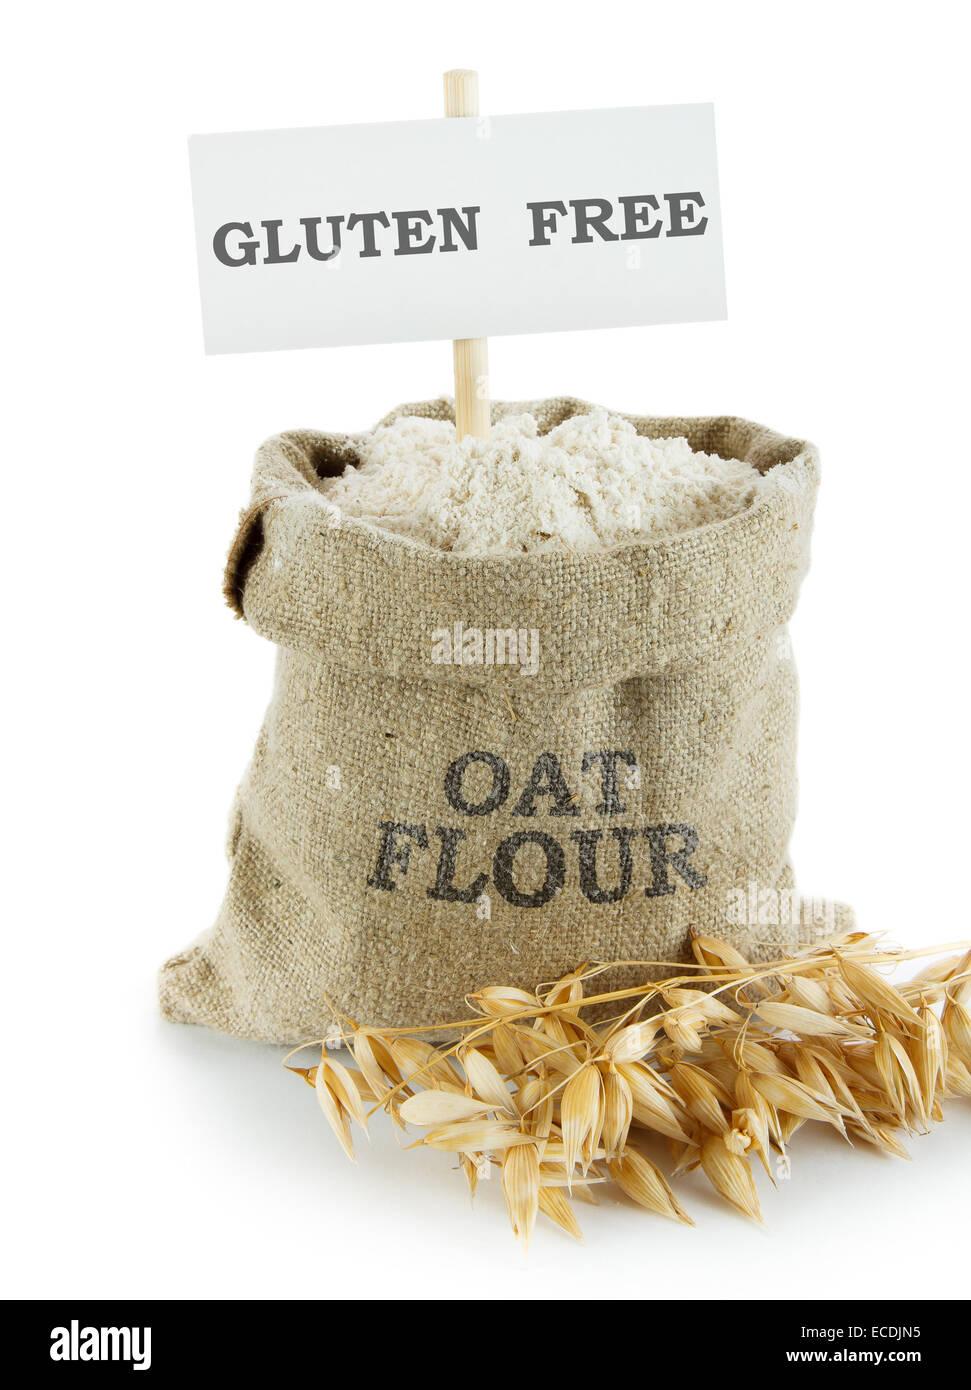 Oat flour in small linen sack - Stock Image